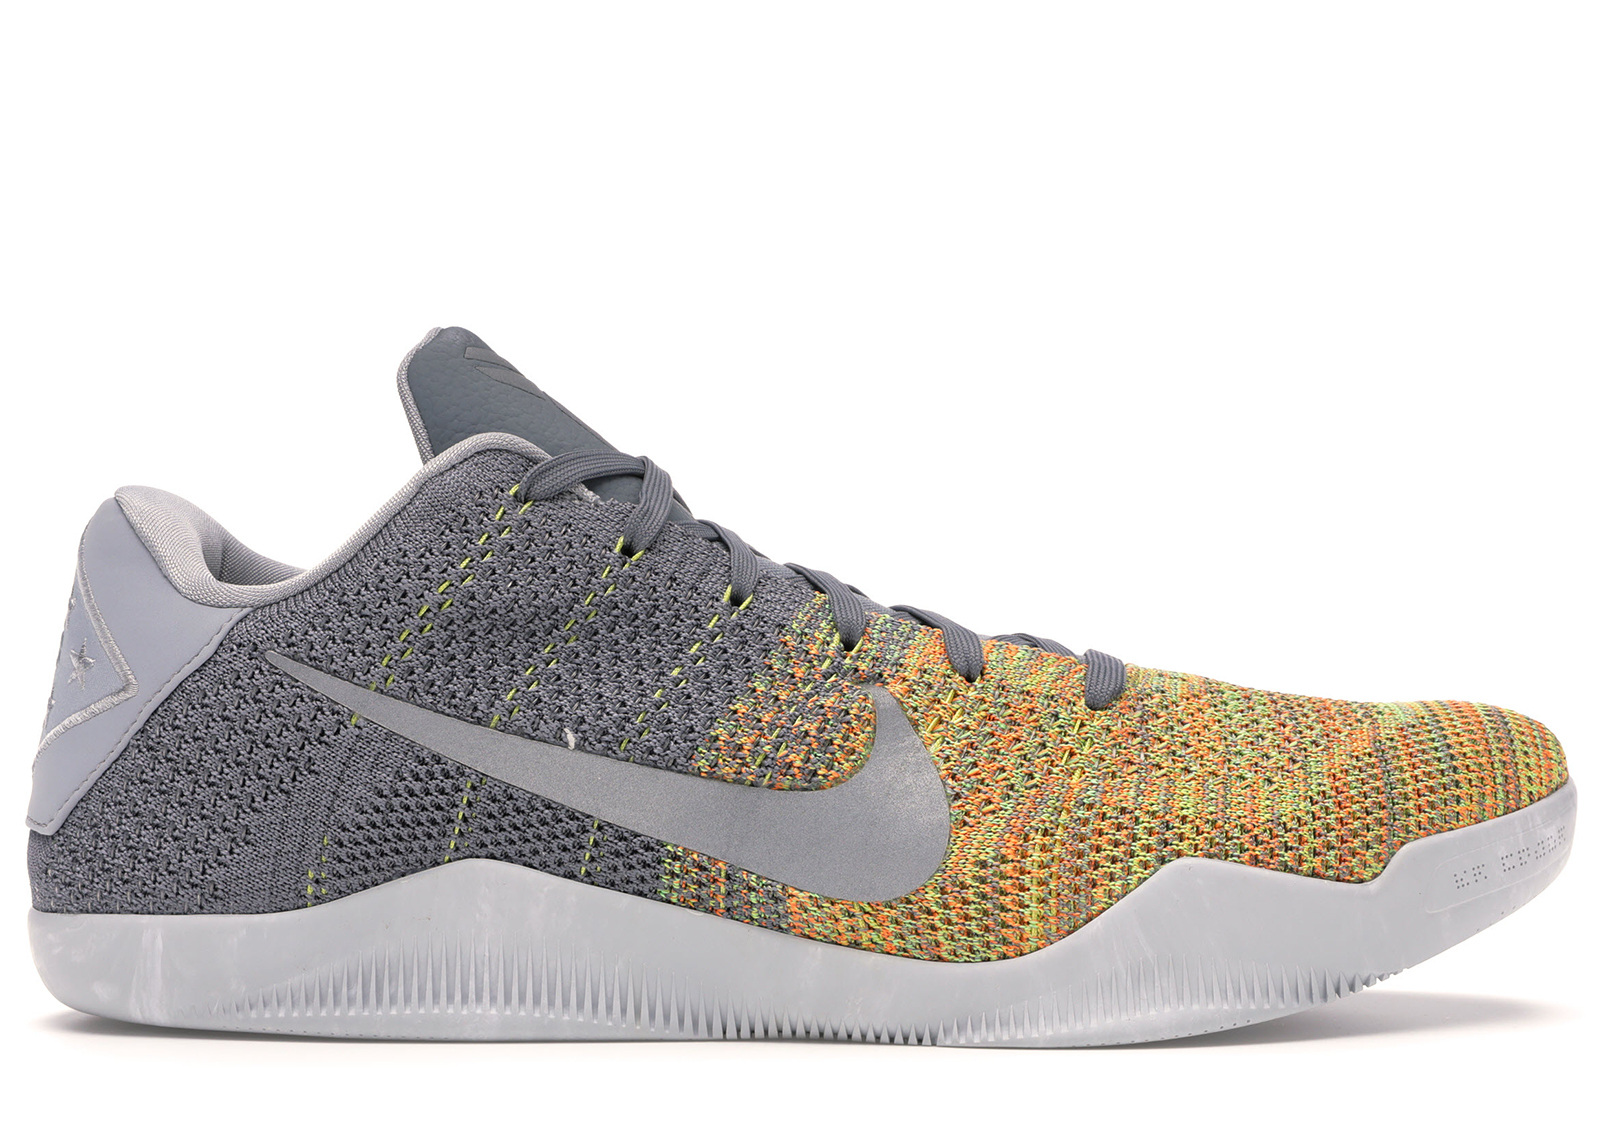 Nike Kobe 11 Elite Low Master of Innovation - 822675-037